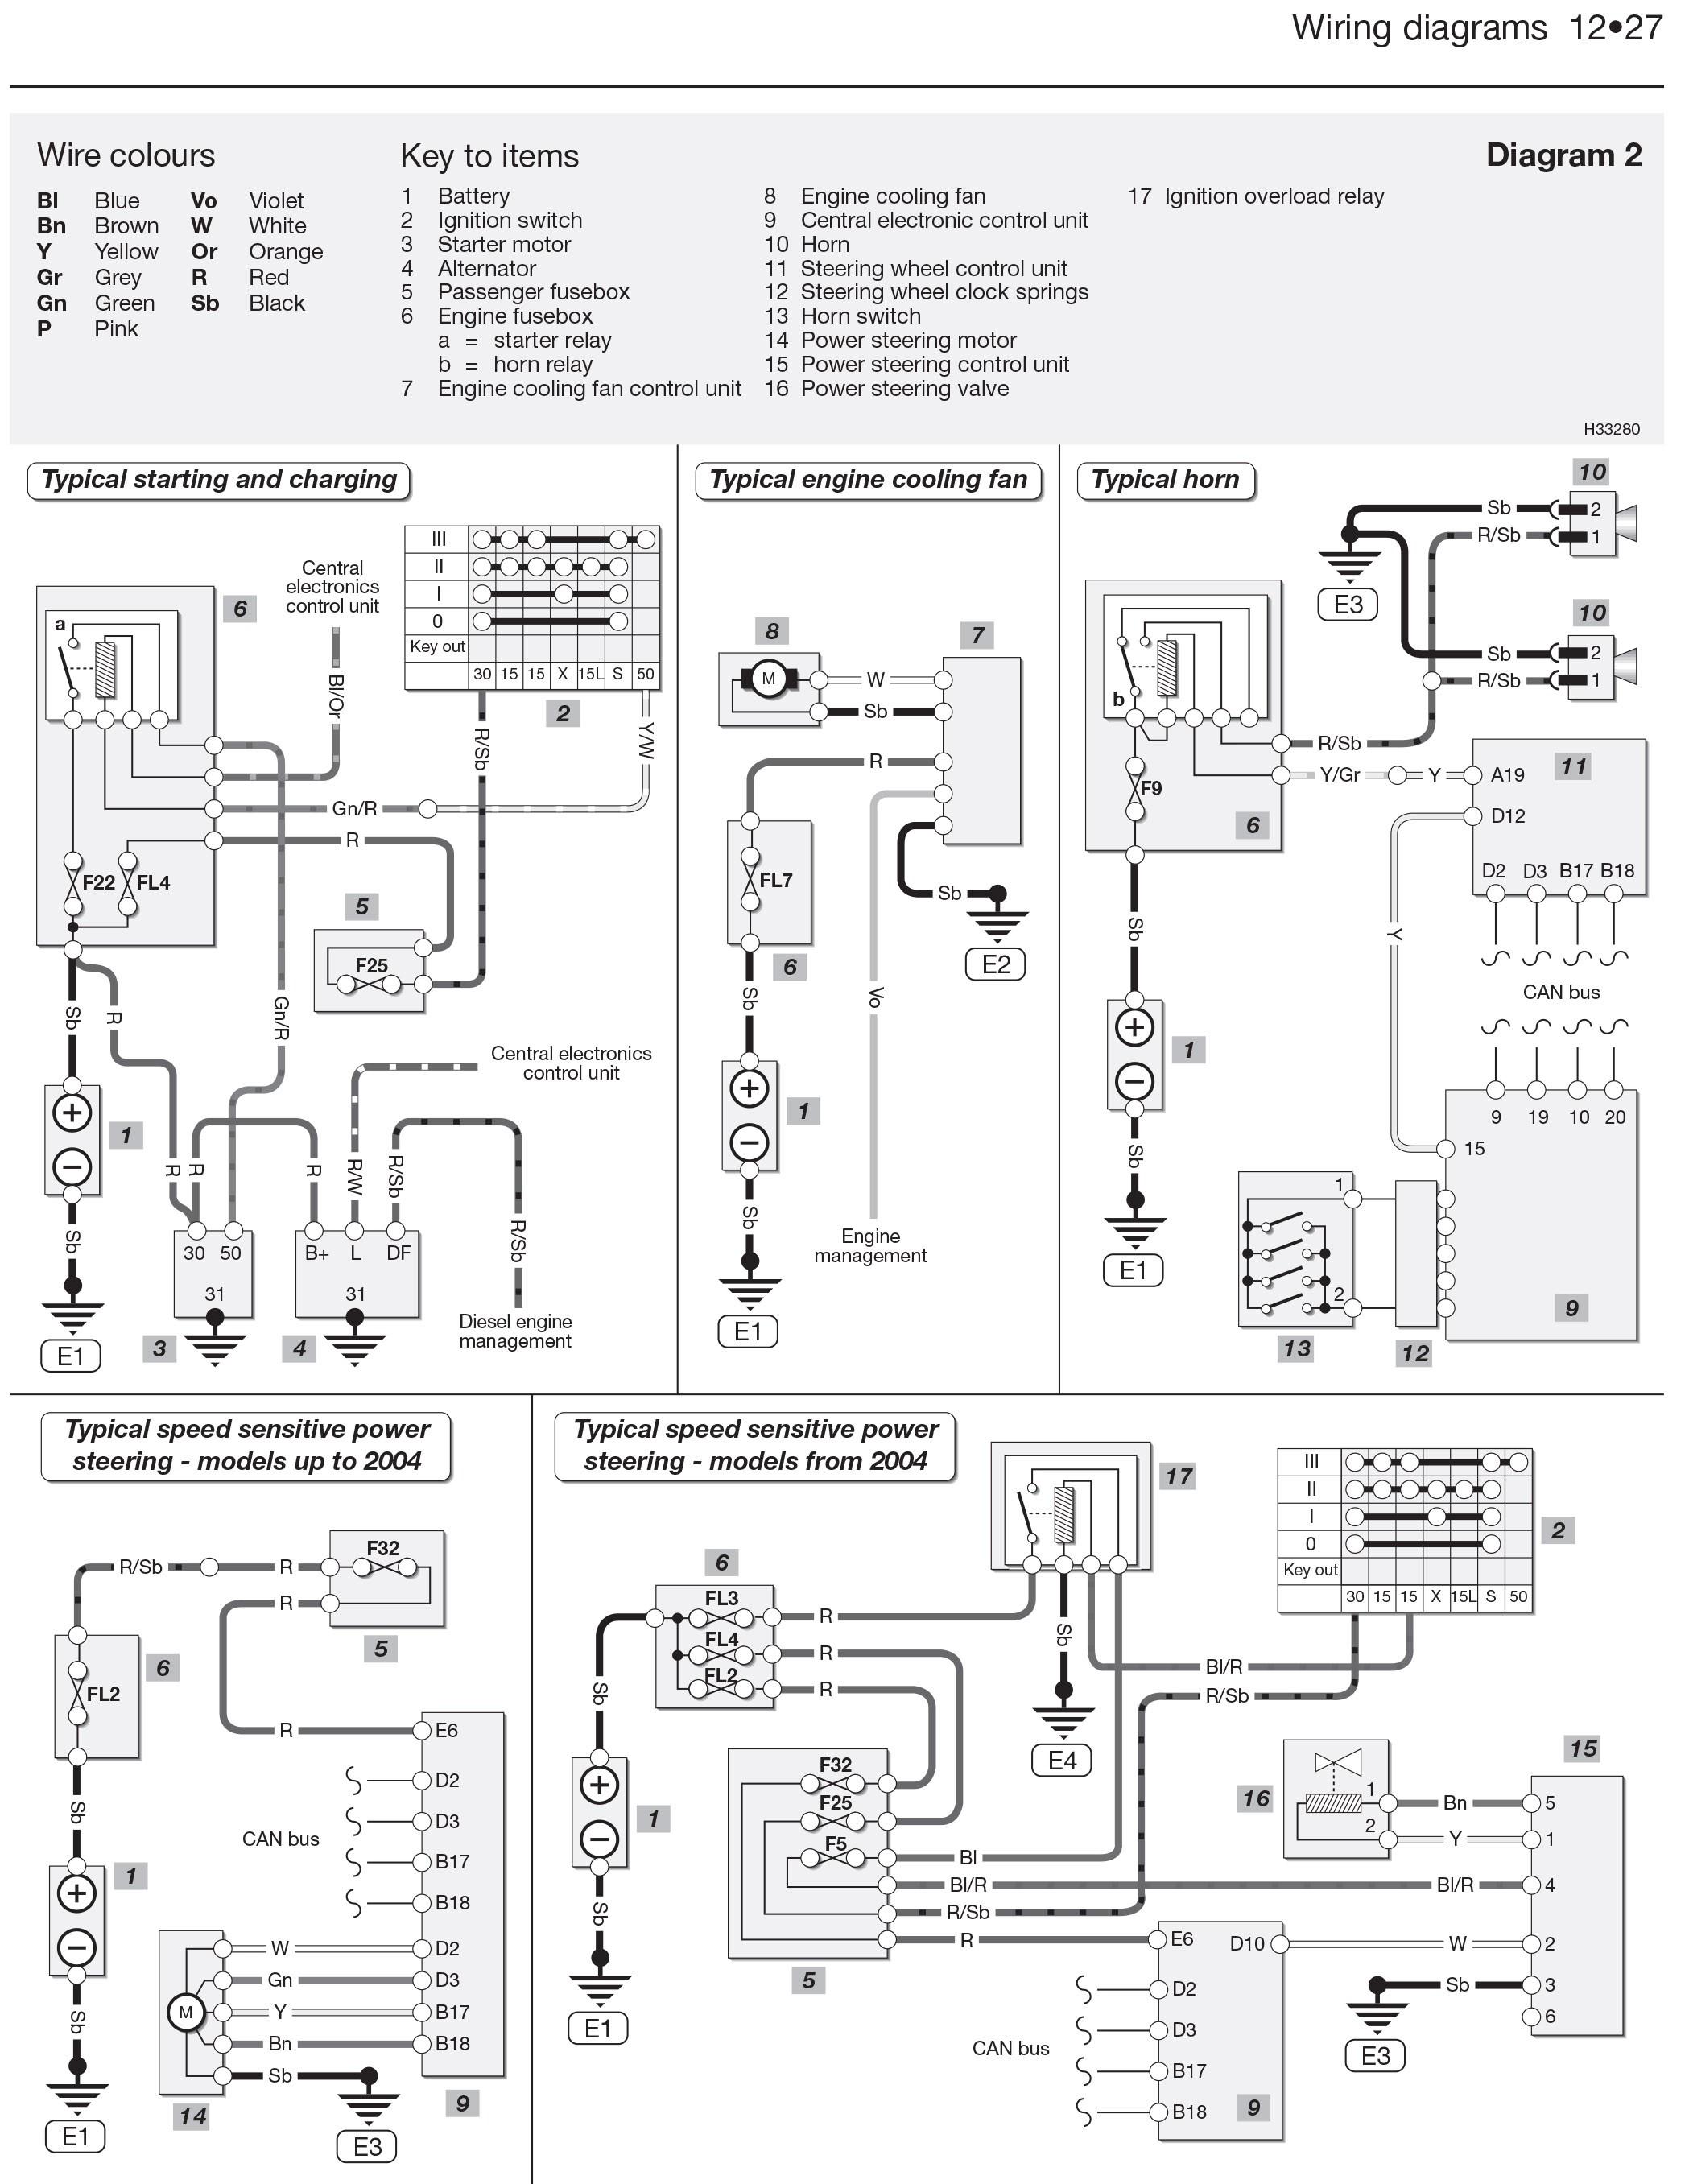 Volvo S80 2000 Wiring Diagram Volvo V70 S80 Petrol & Diesel 1998 2007 S to 07 Haynes Line Manual Of Volvo S80 2000 Wiring Diagram